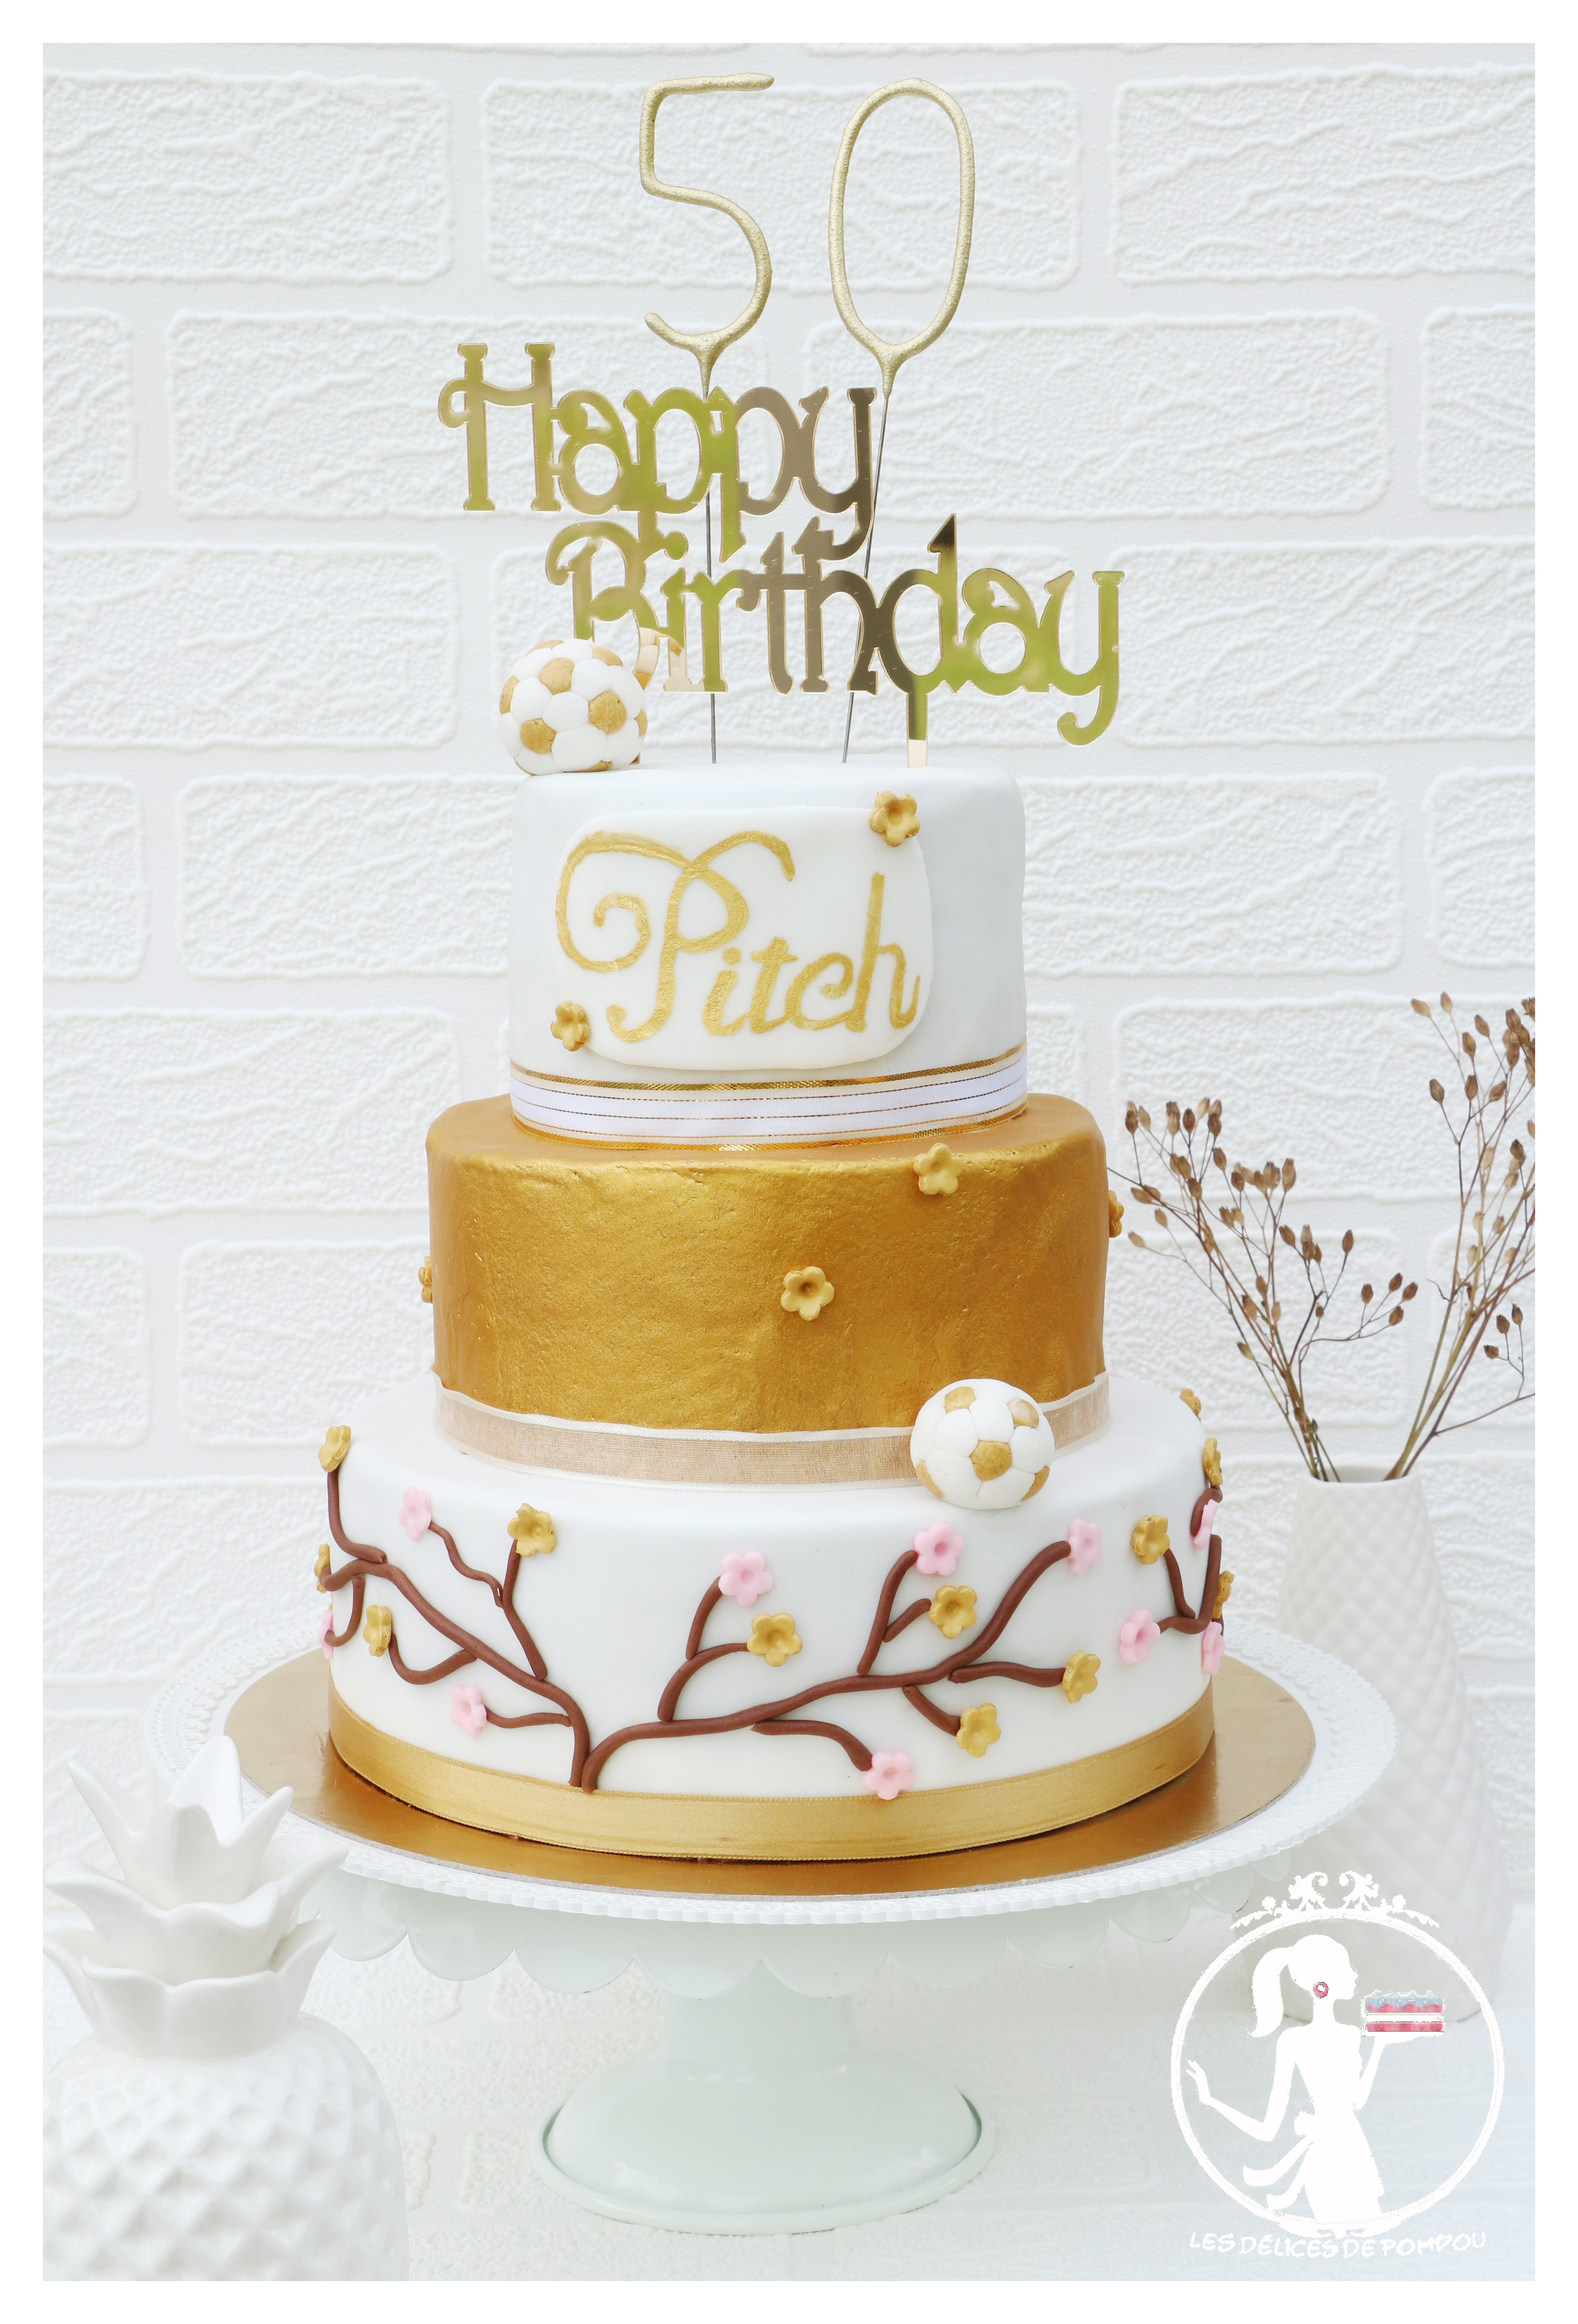 Pitch'cake